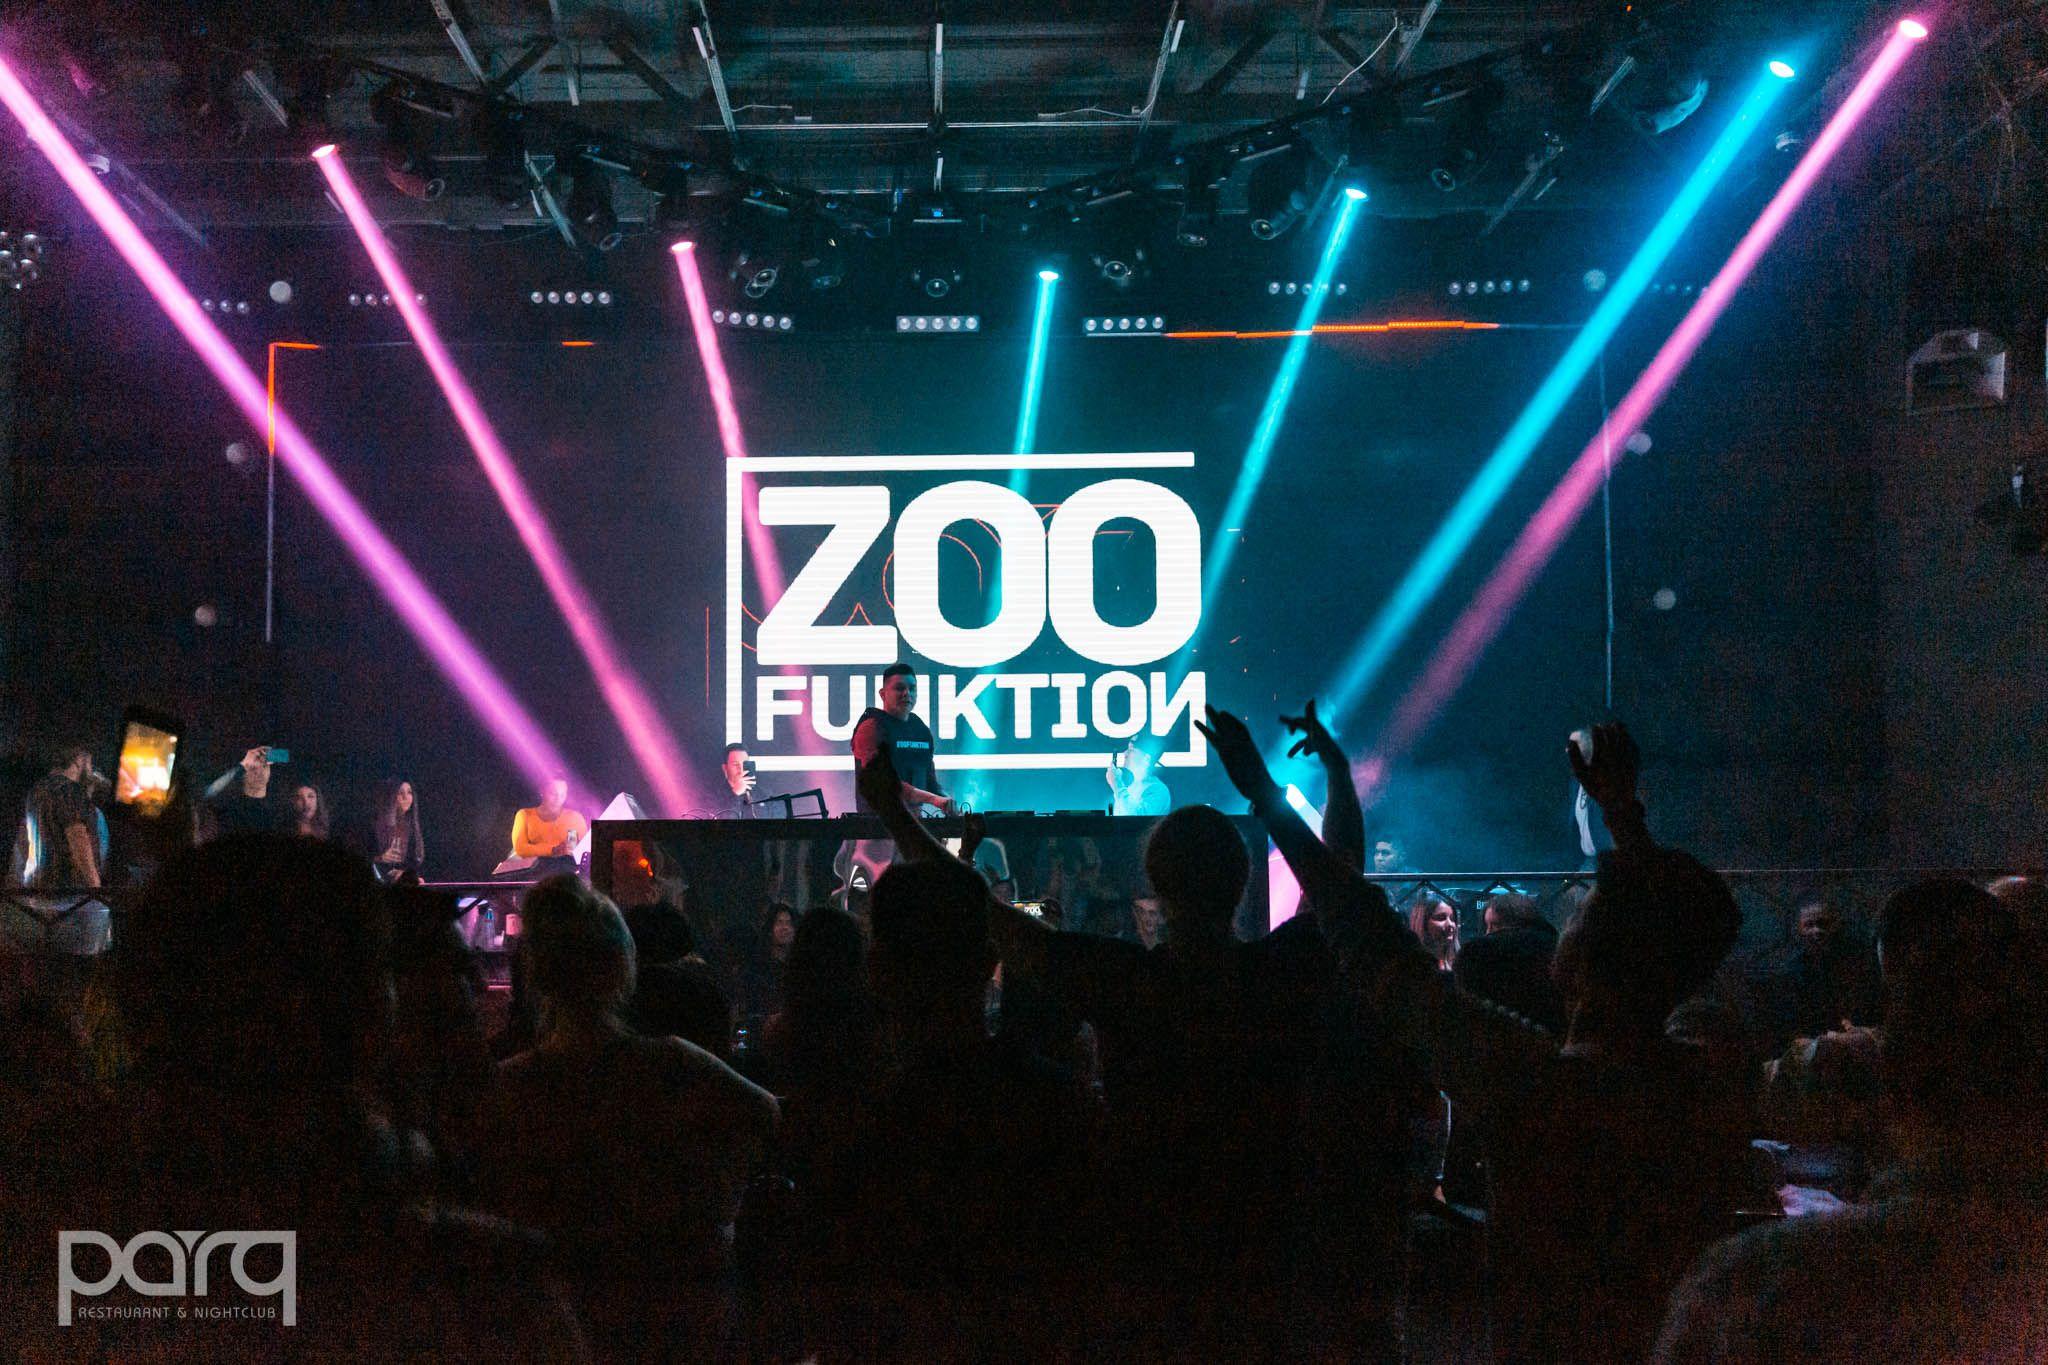 11.02.18 Parq - Zoo Function-1.jpg